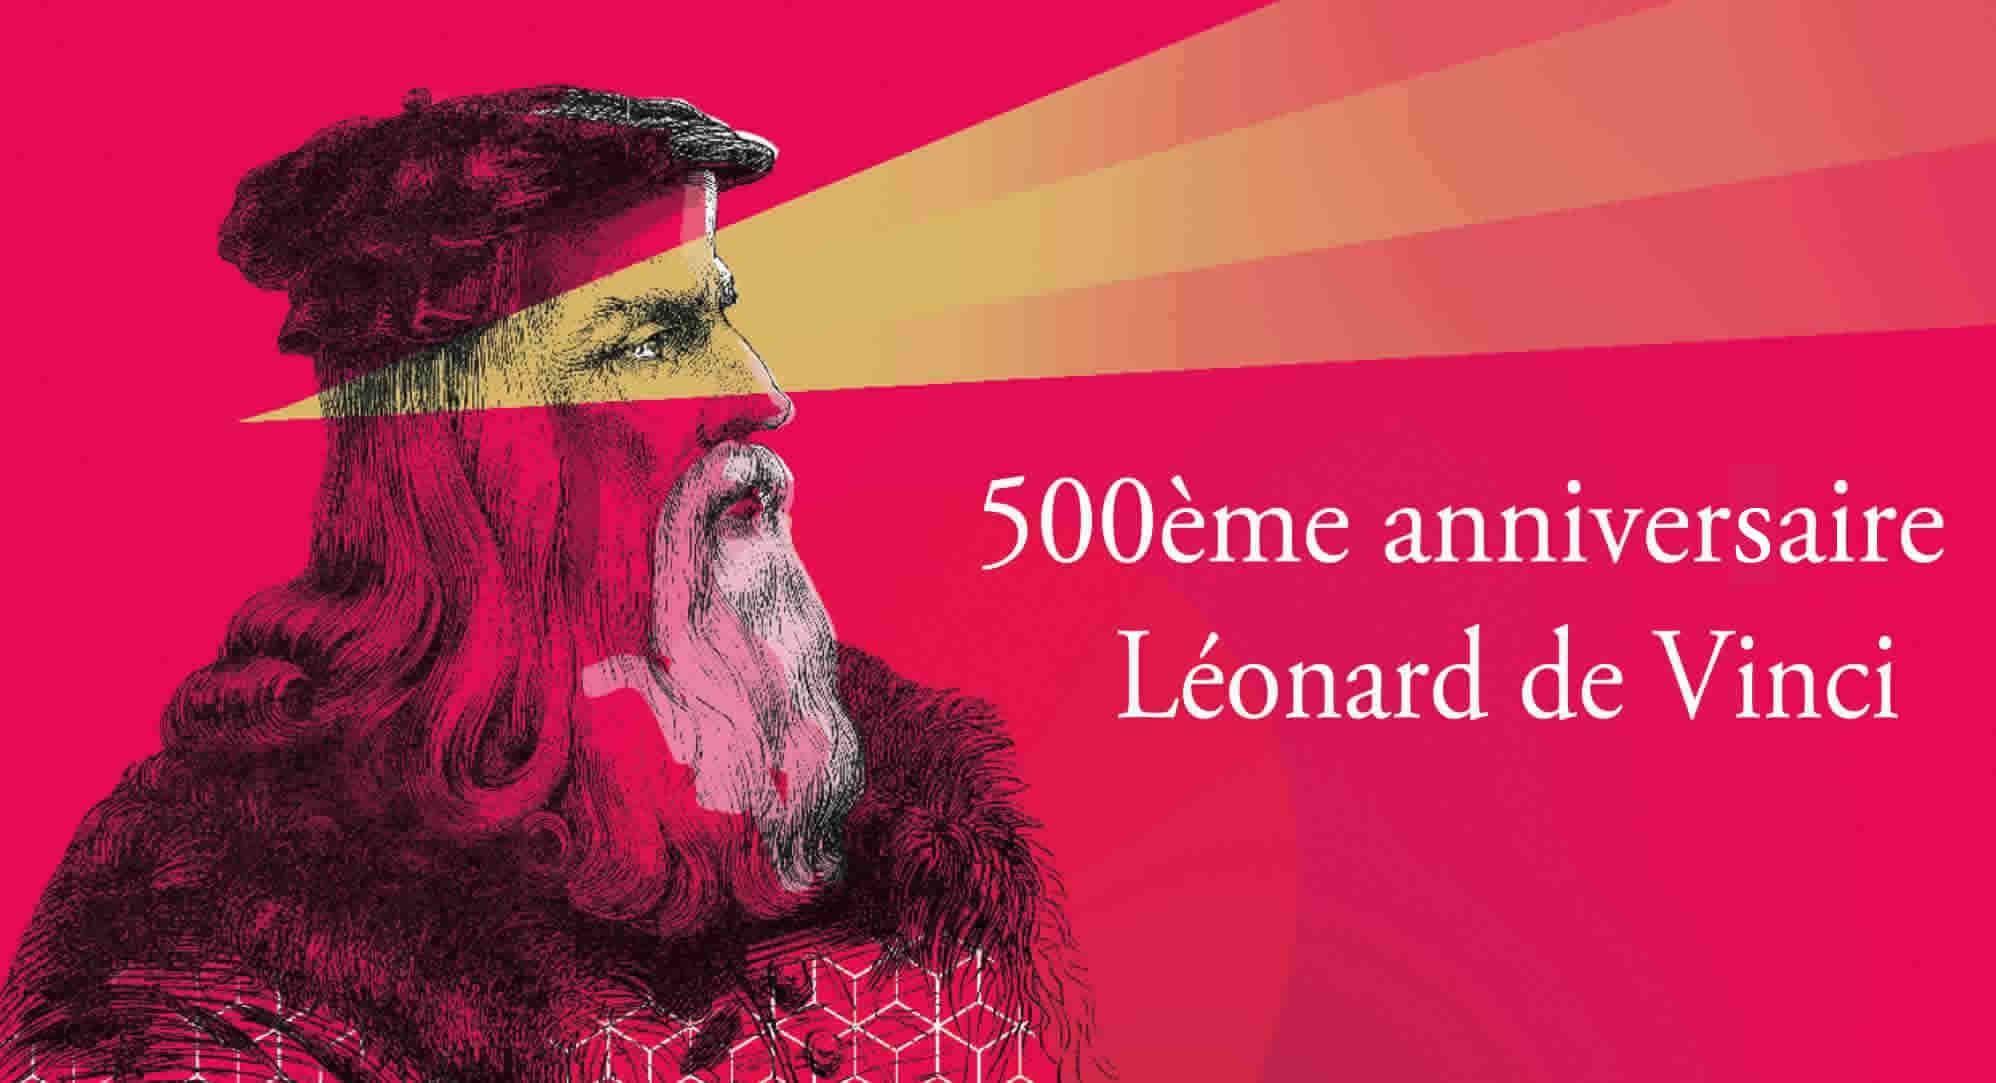 Leonard de Vinci 500e anniversaire